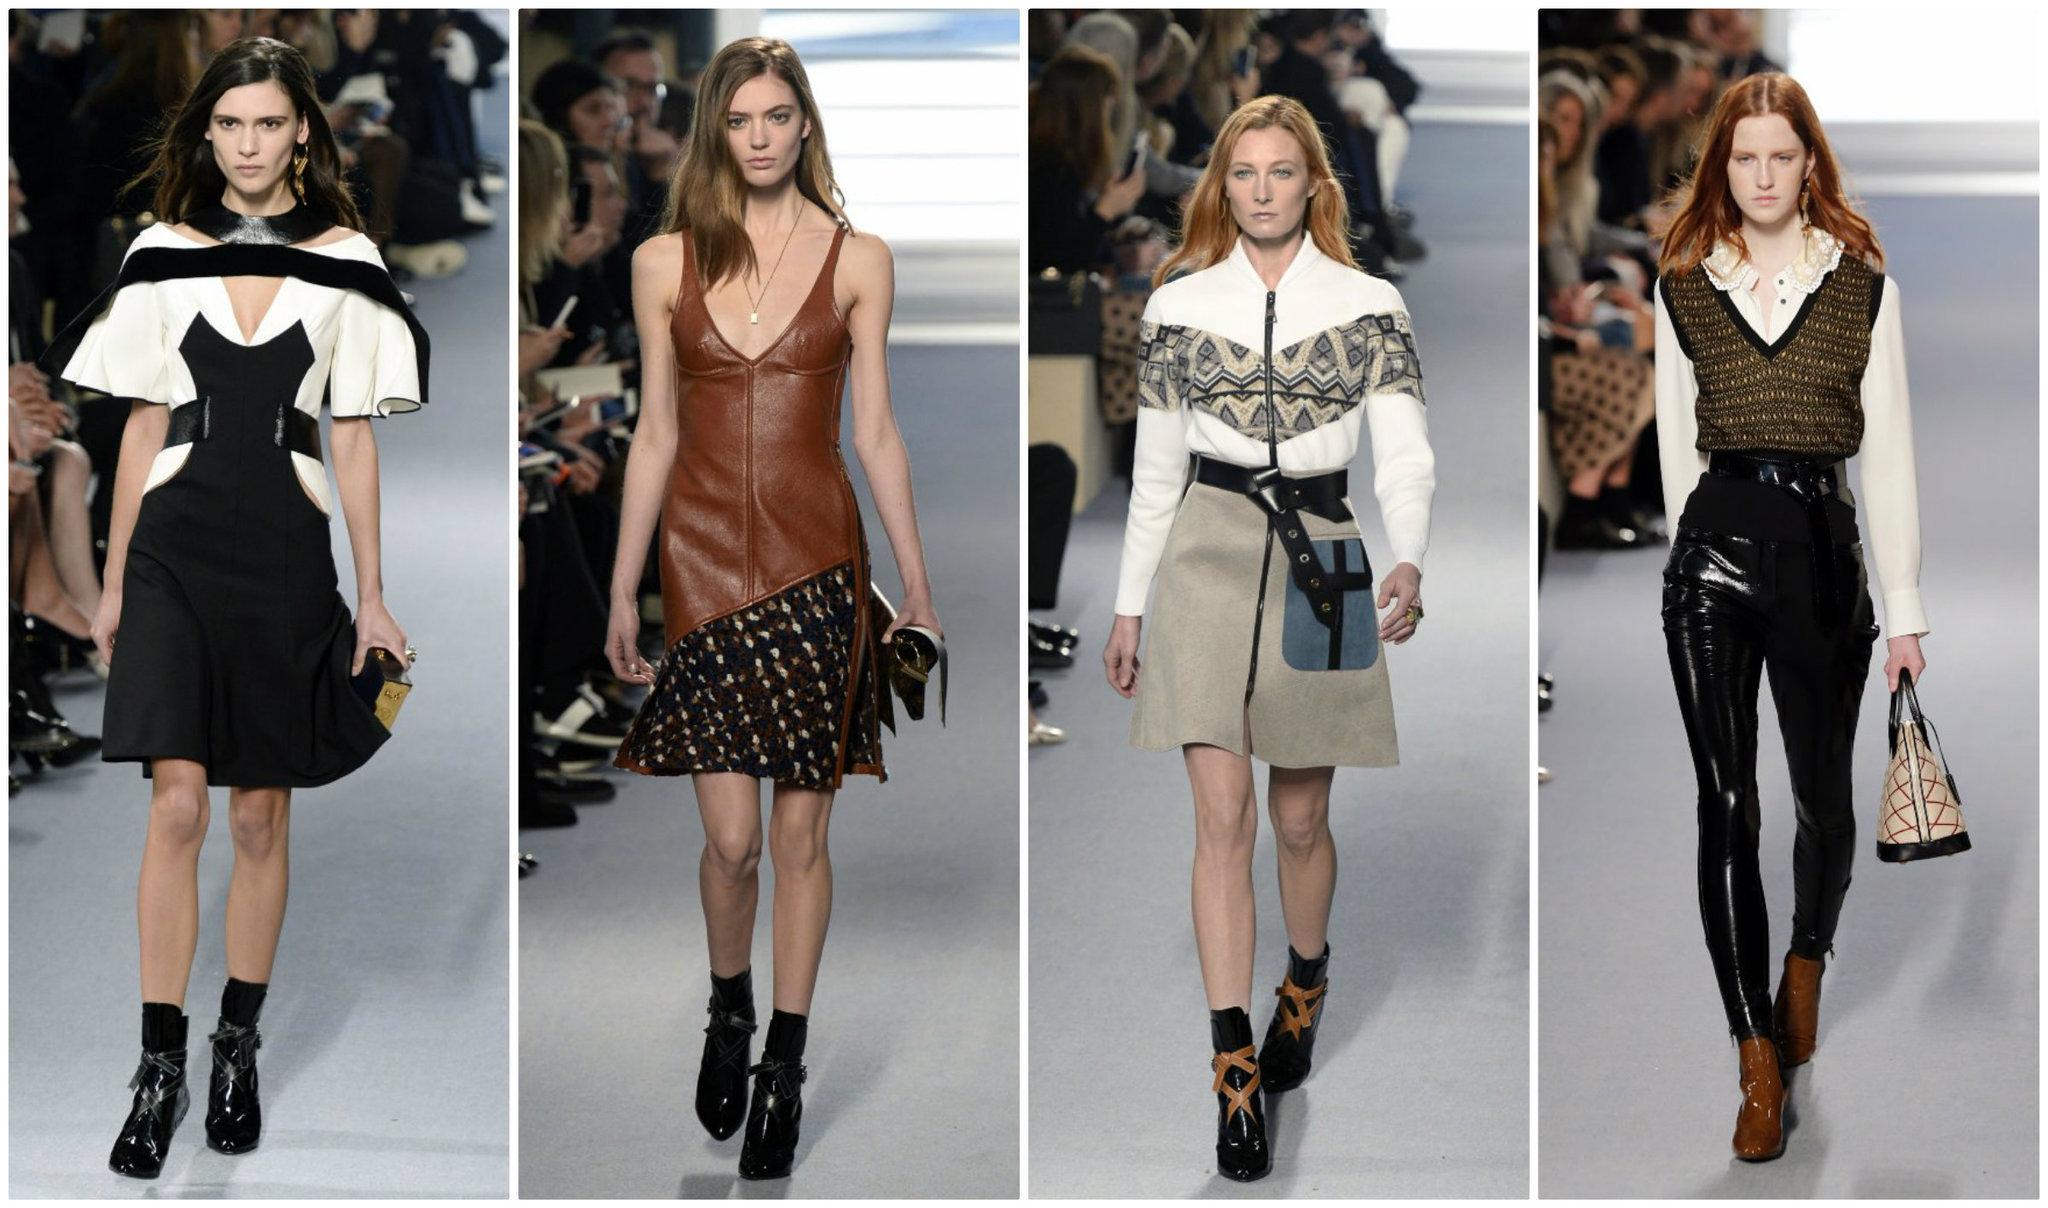 Paris Fashion Week: At Louis Vuitton, a new era begins ...